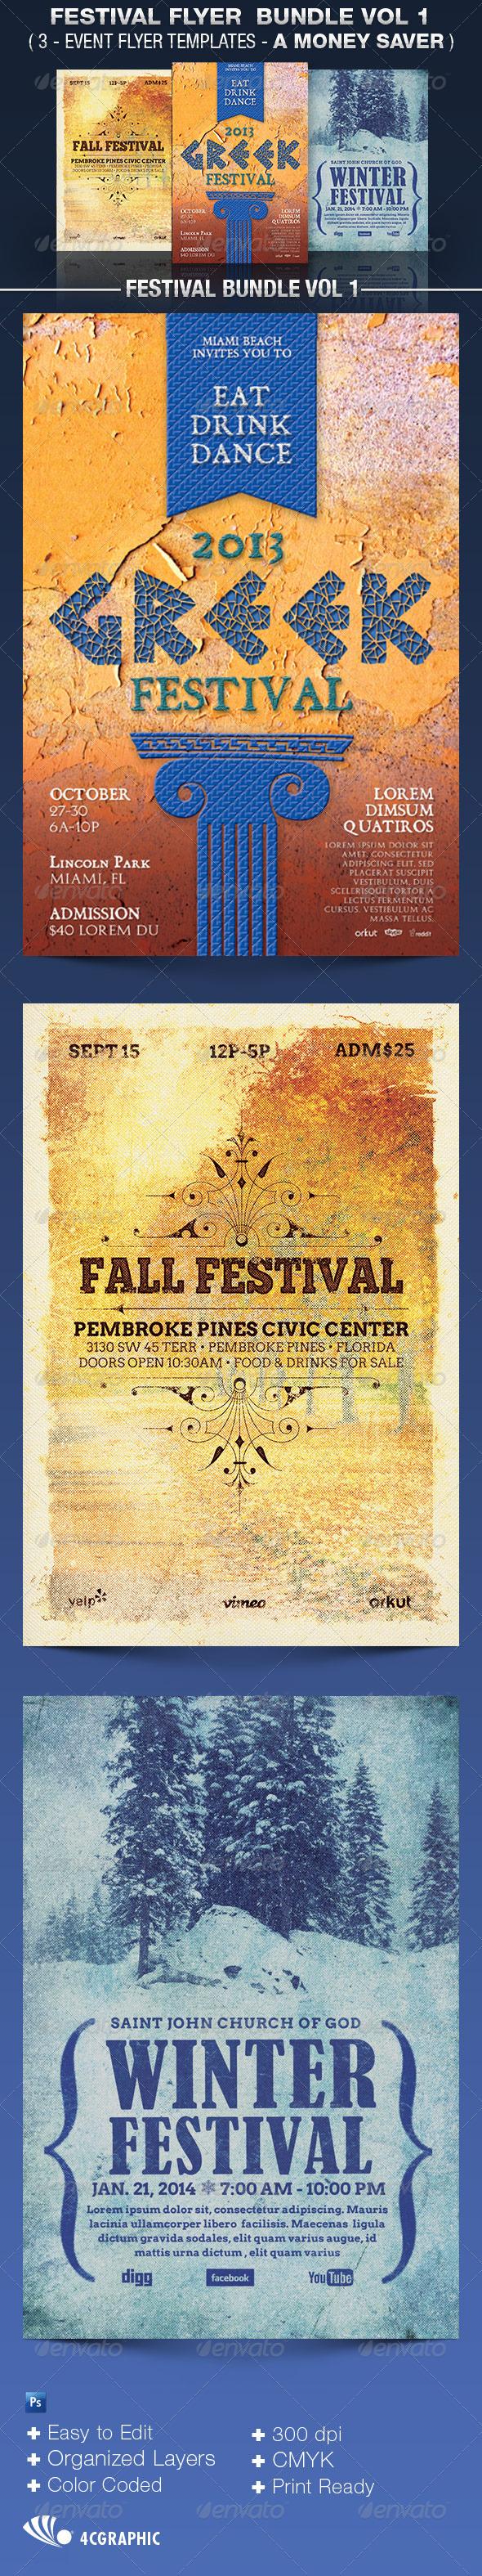 Festival Flyer Templates Bundle Vol 1 - Events Flyers